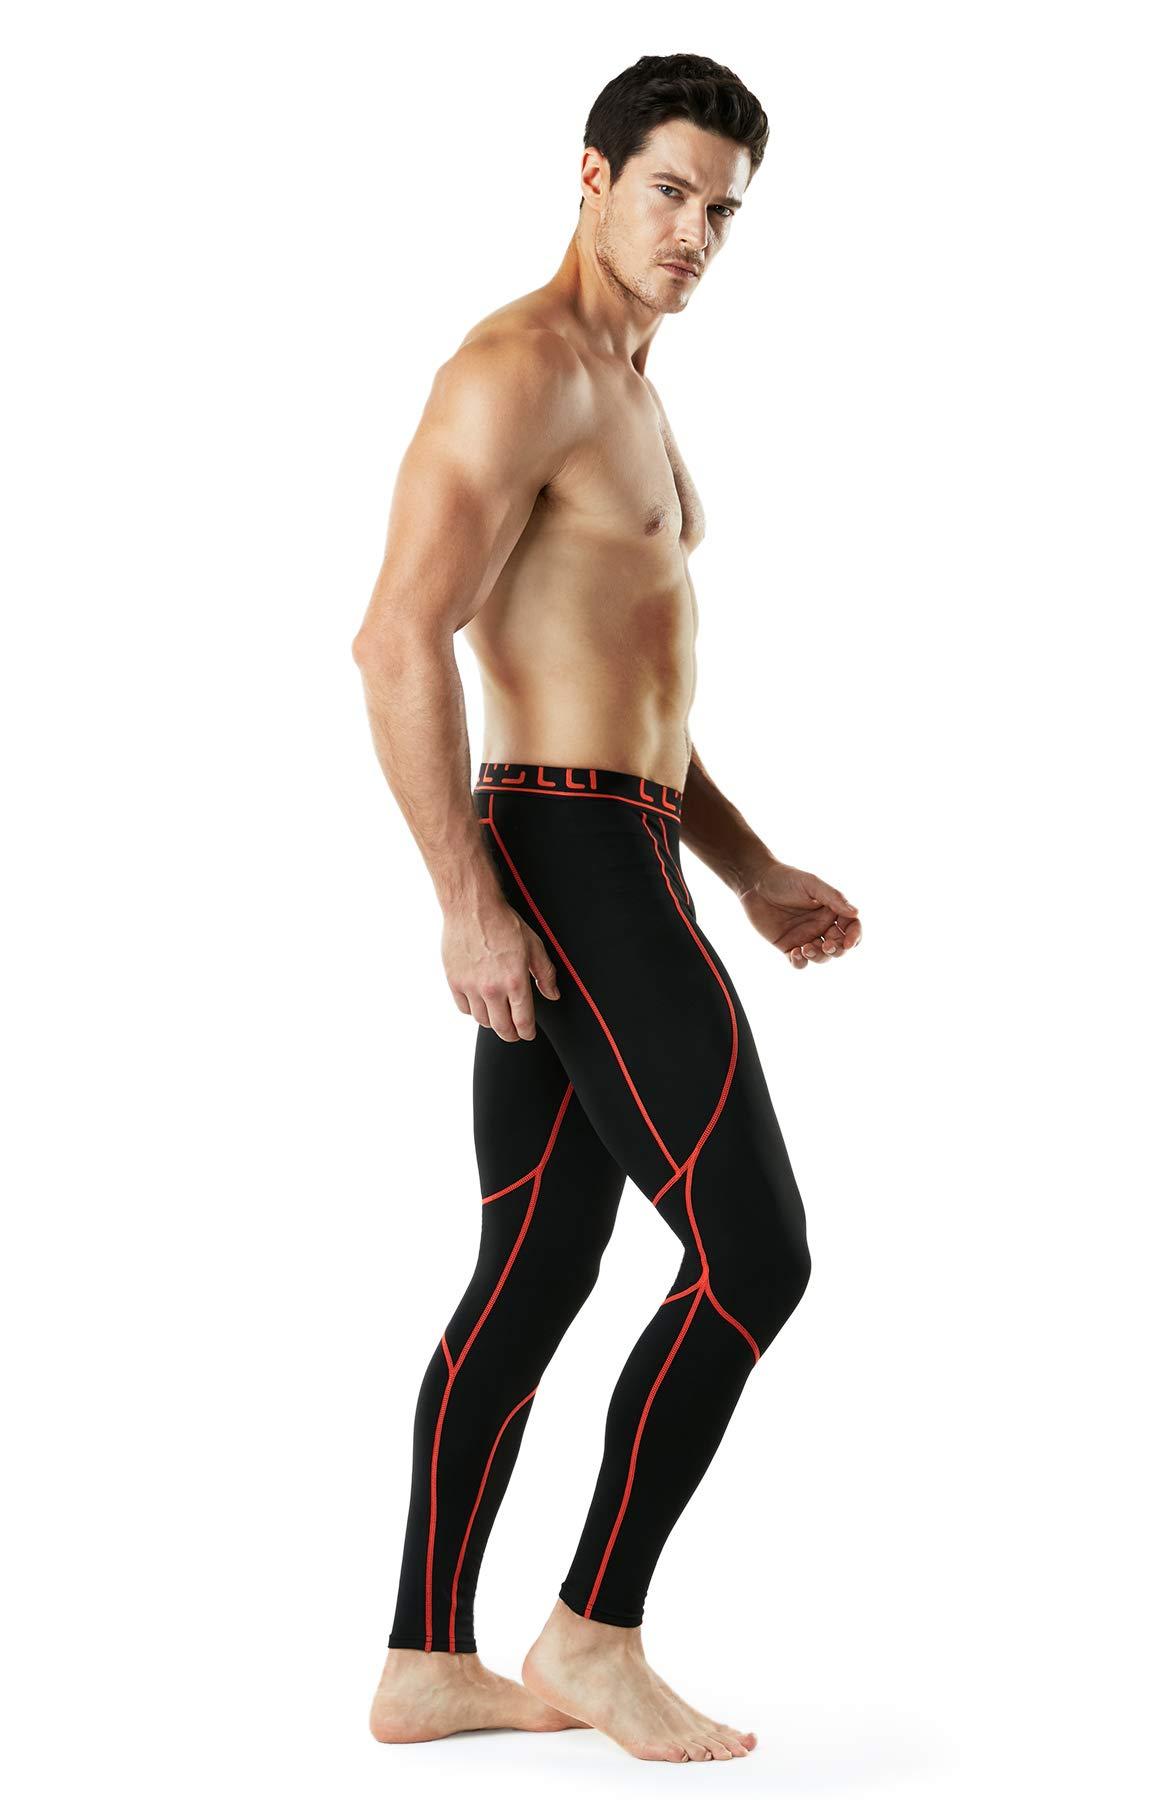 TM-YUP43-KOG_2X-Large Tesla Men's Thermal Wintergear Compression Baselayer Pants Leggings Tights YUP43 by TSLA (Image #7)